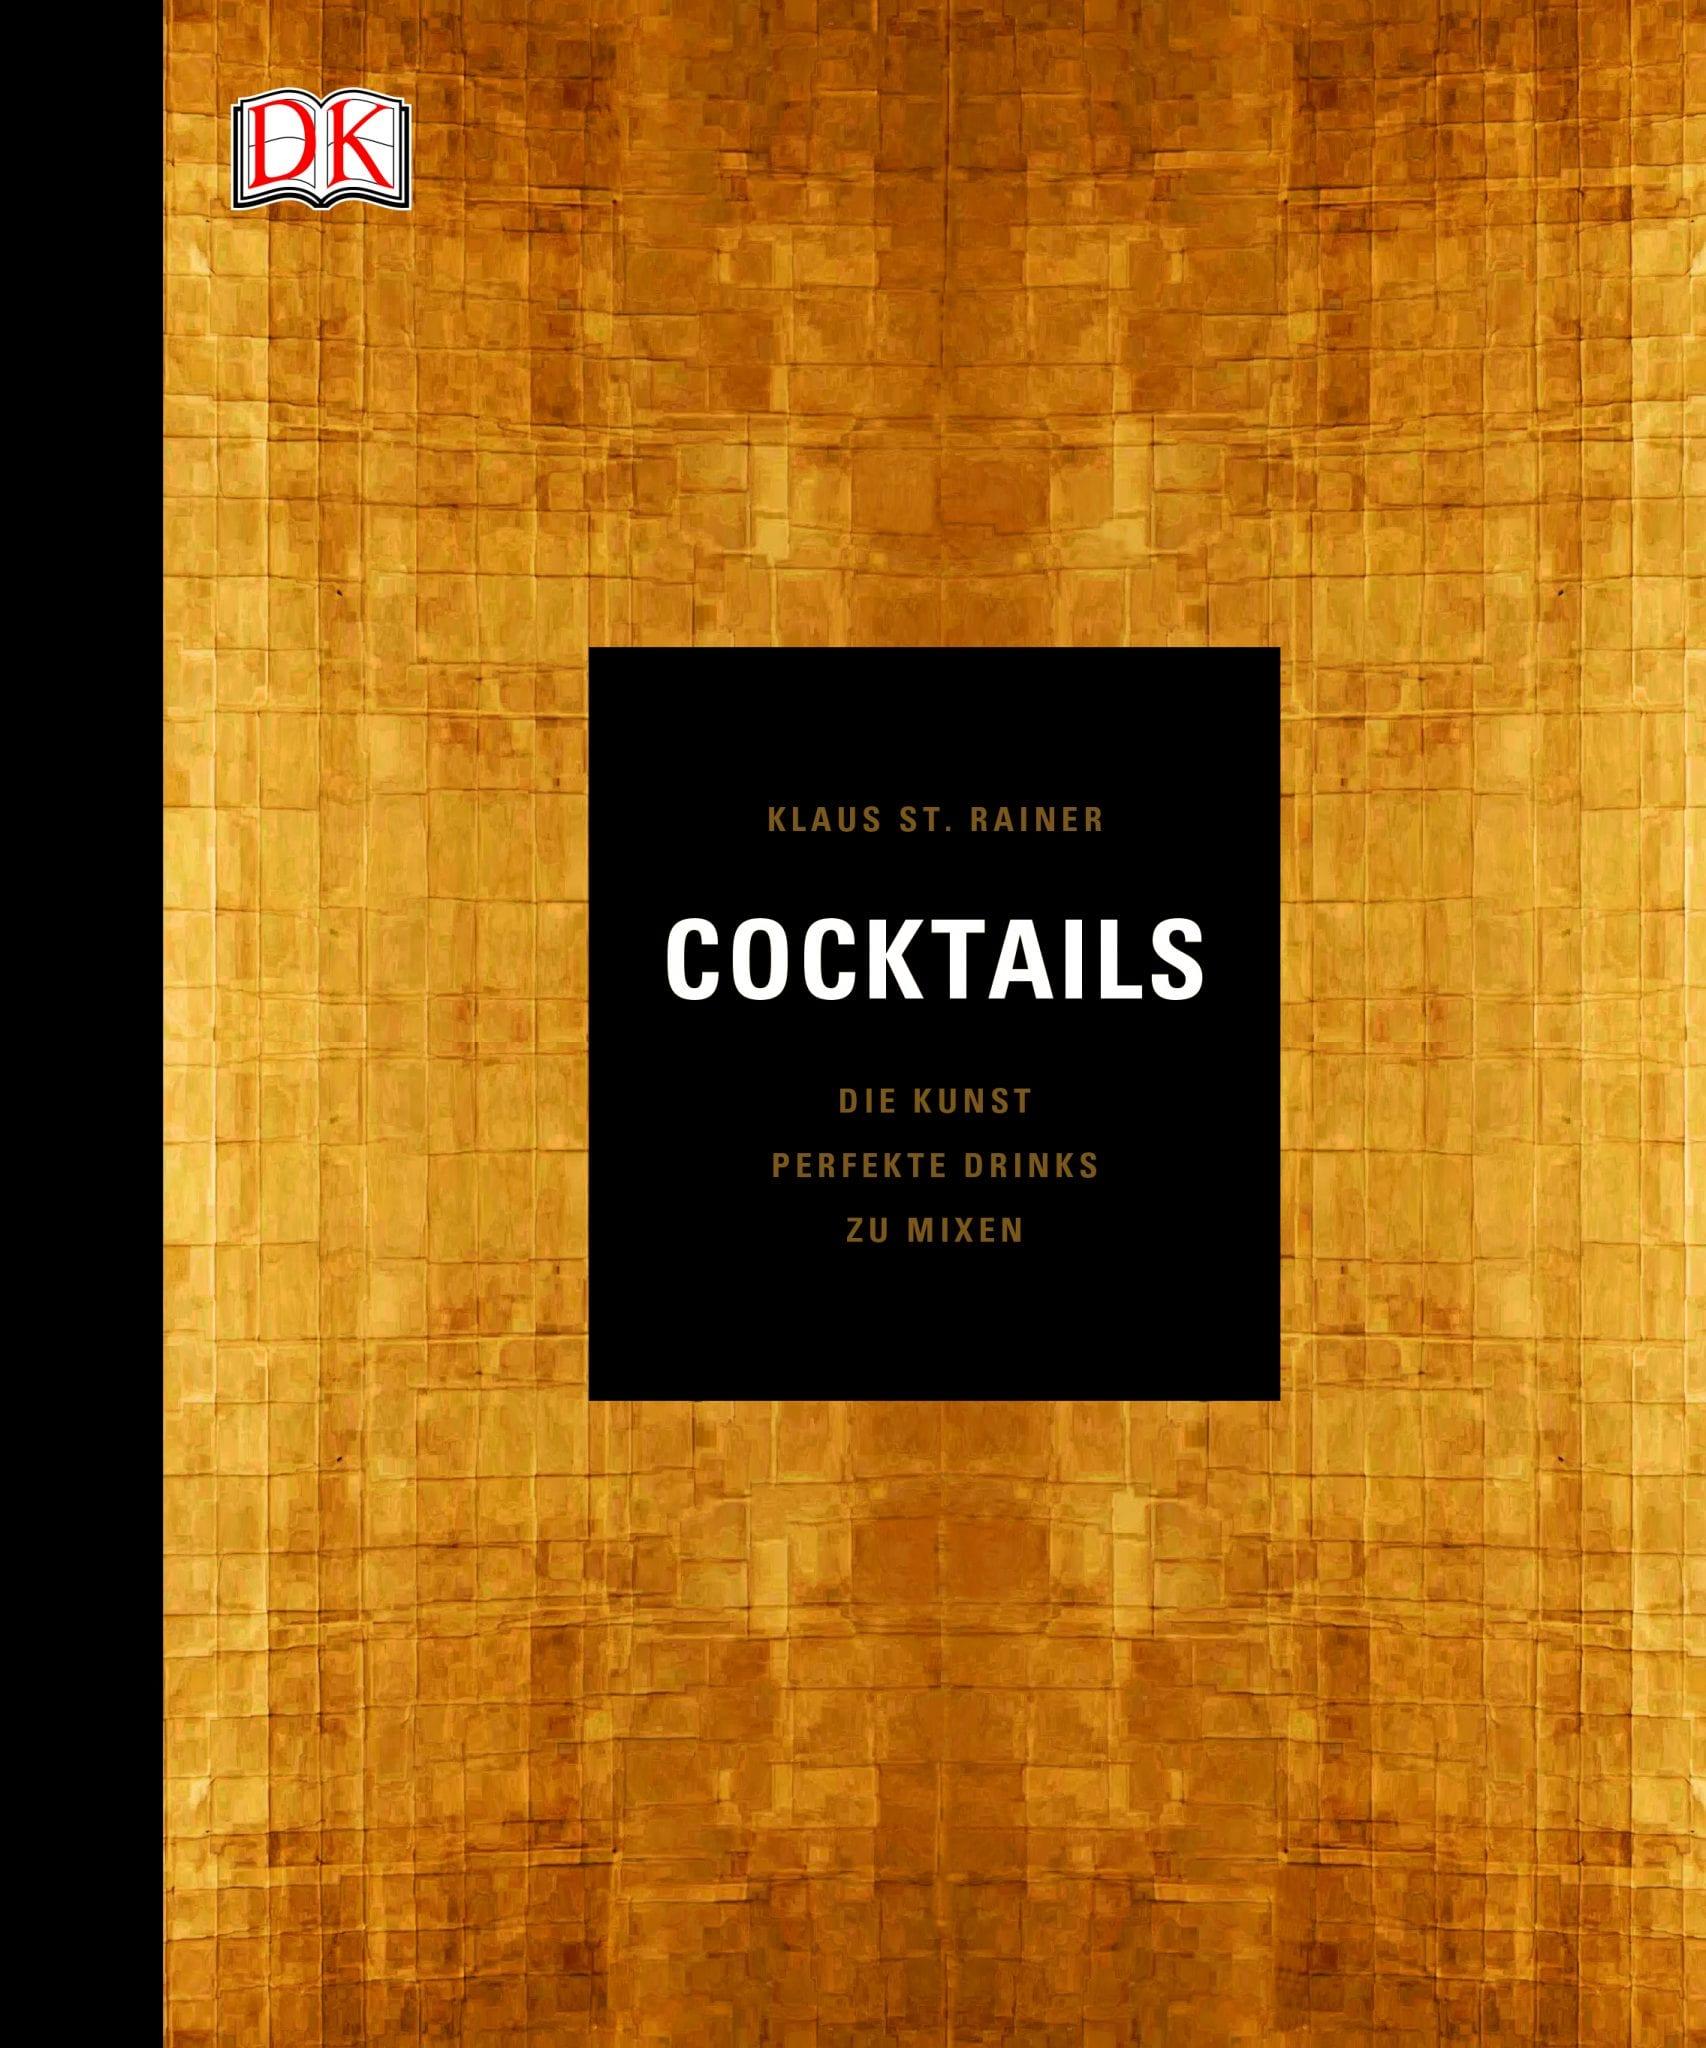 Buch © Dorling Kindersley Verlag, Texte: Klaus St. Rainer, Fotografie: Armin Smailovic